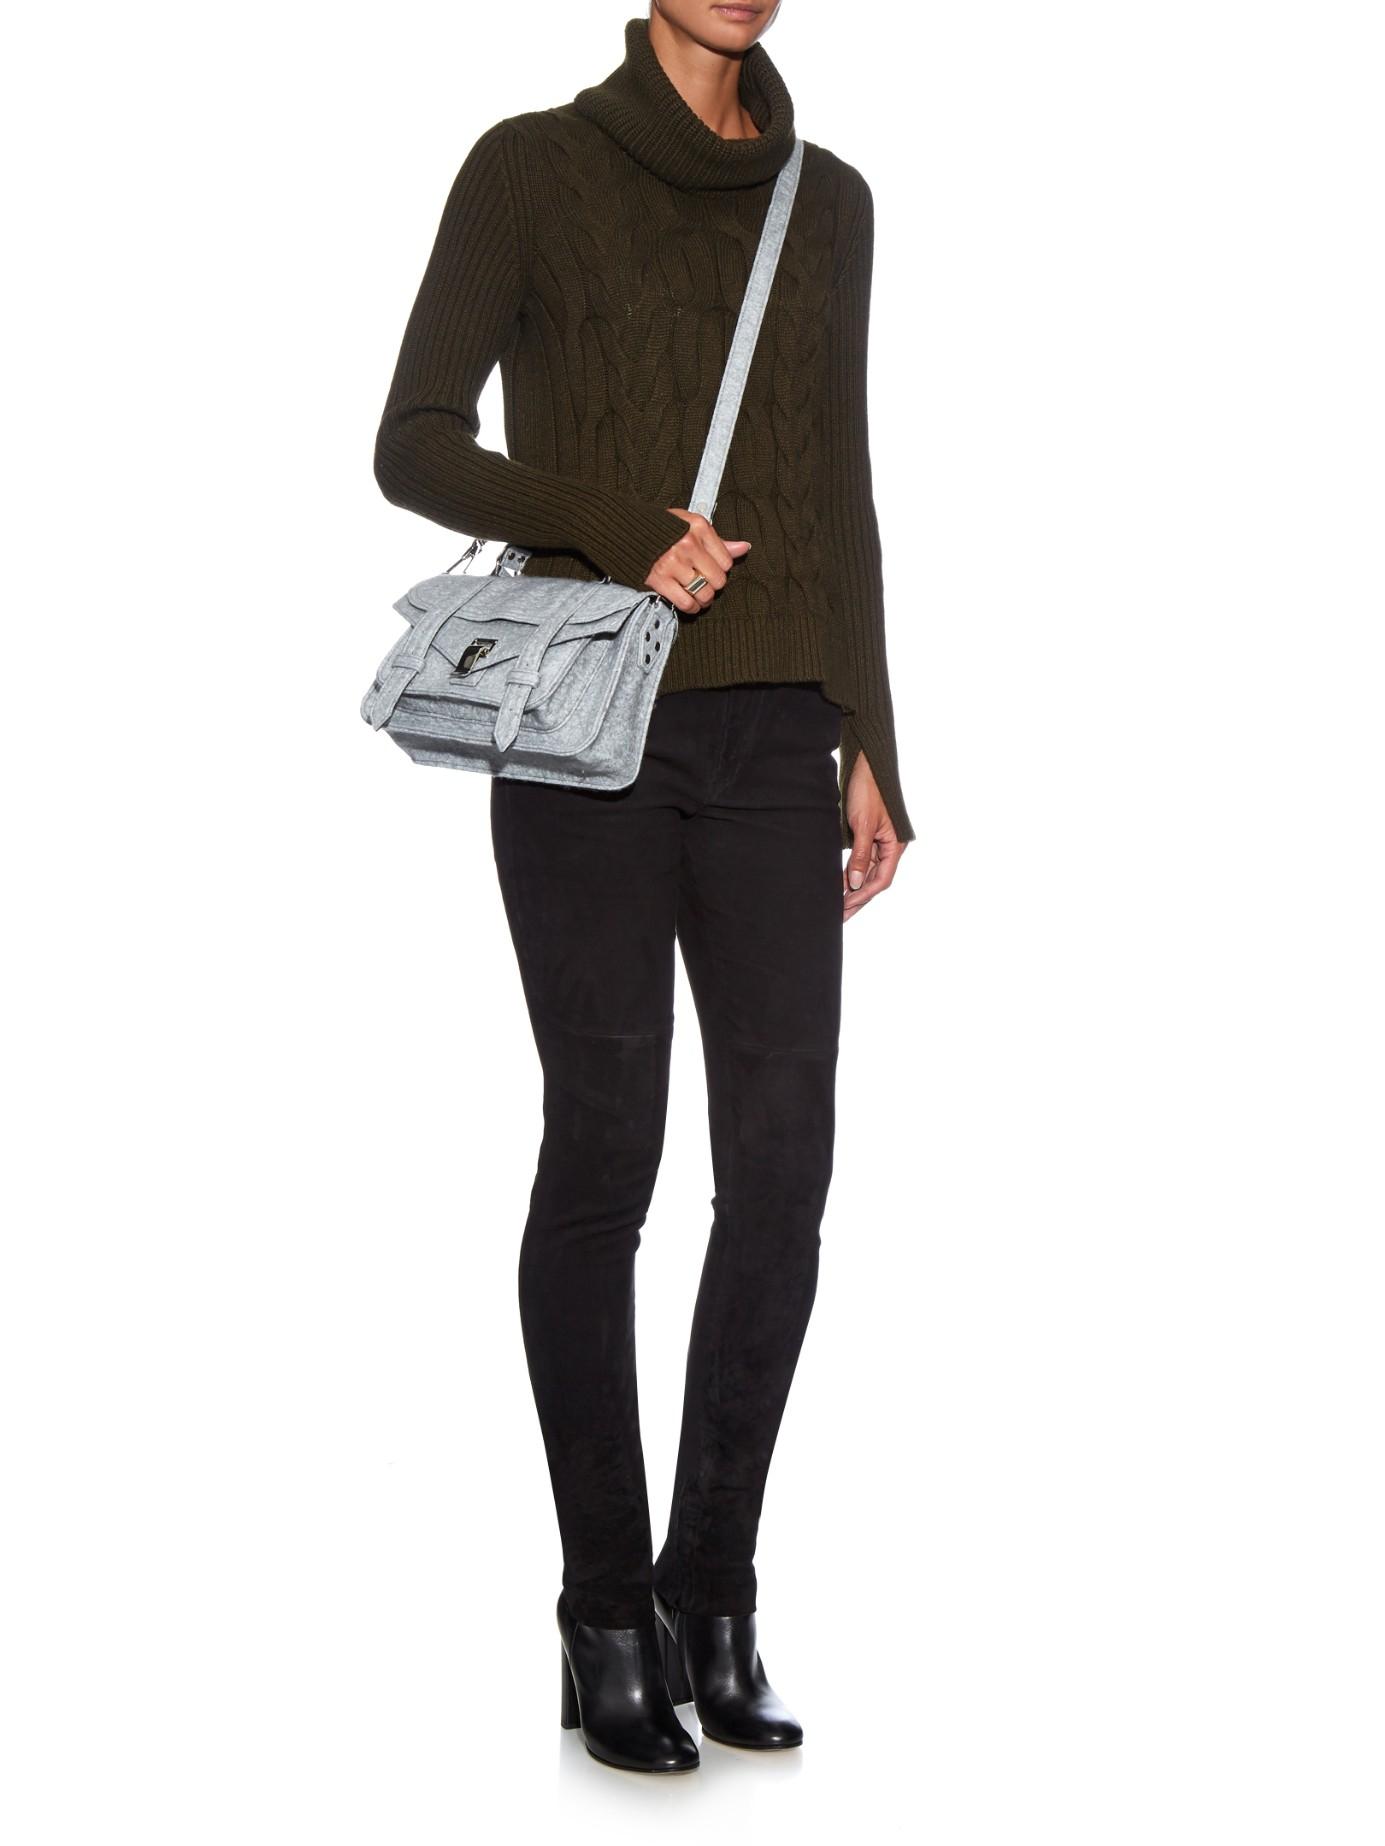 PS1 Mini Crossbody leather shoulder bag Proenza Schouler ZWGsr88x